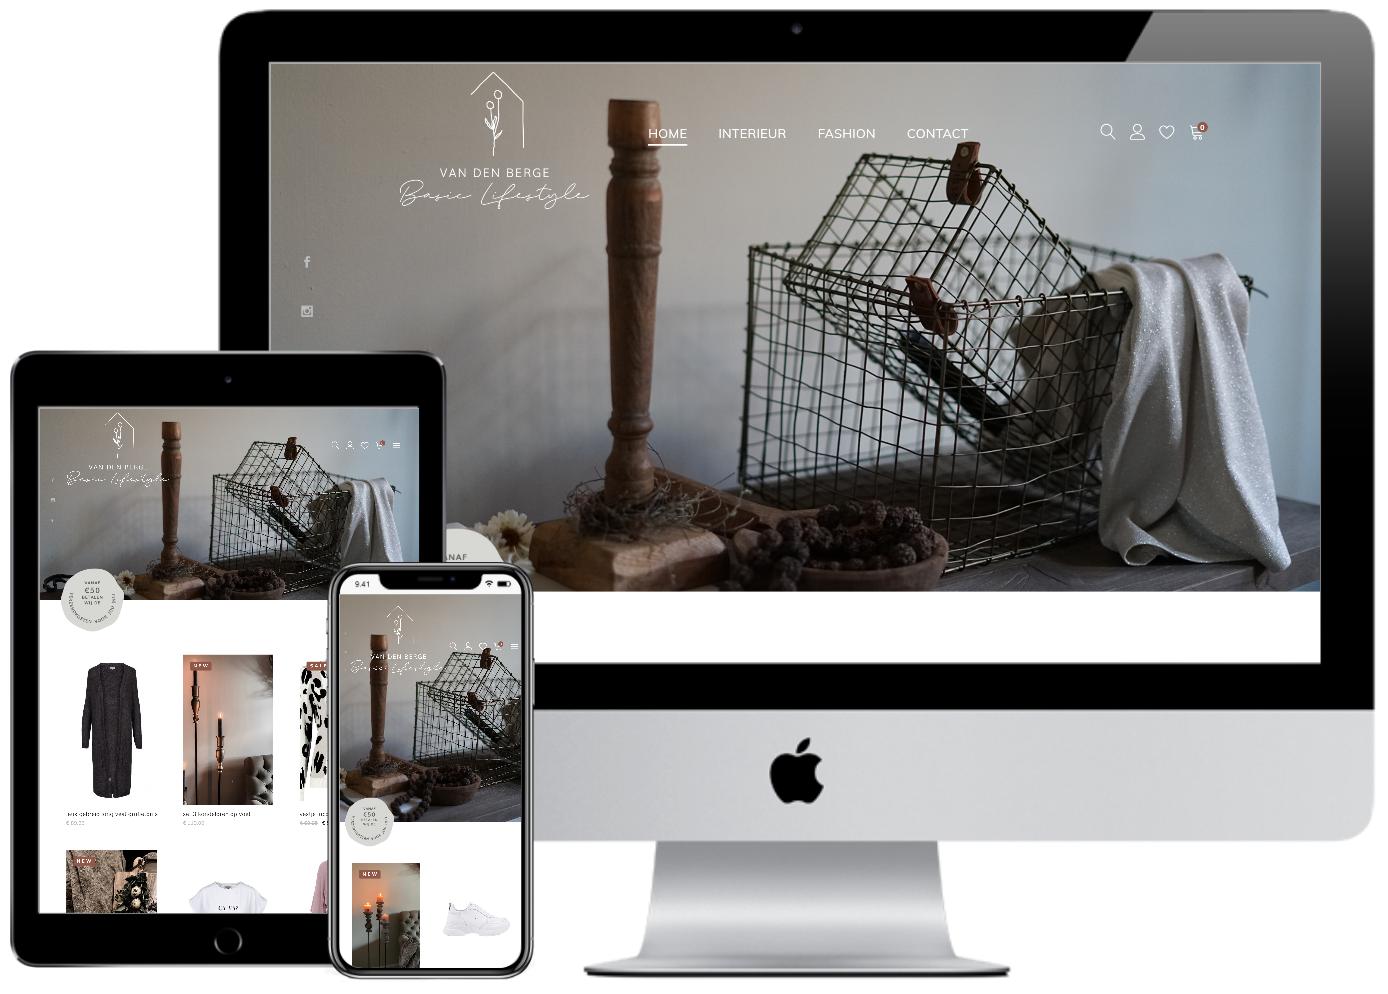 Responsive webshop Van den Berg Basic Lifestyle